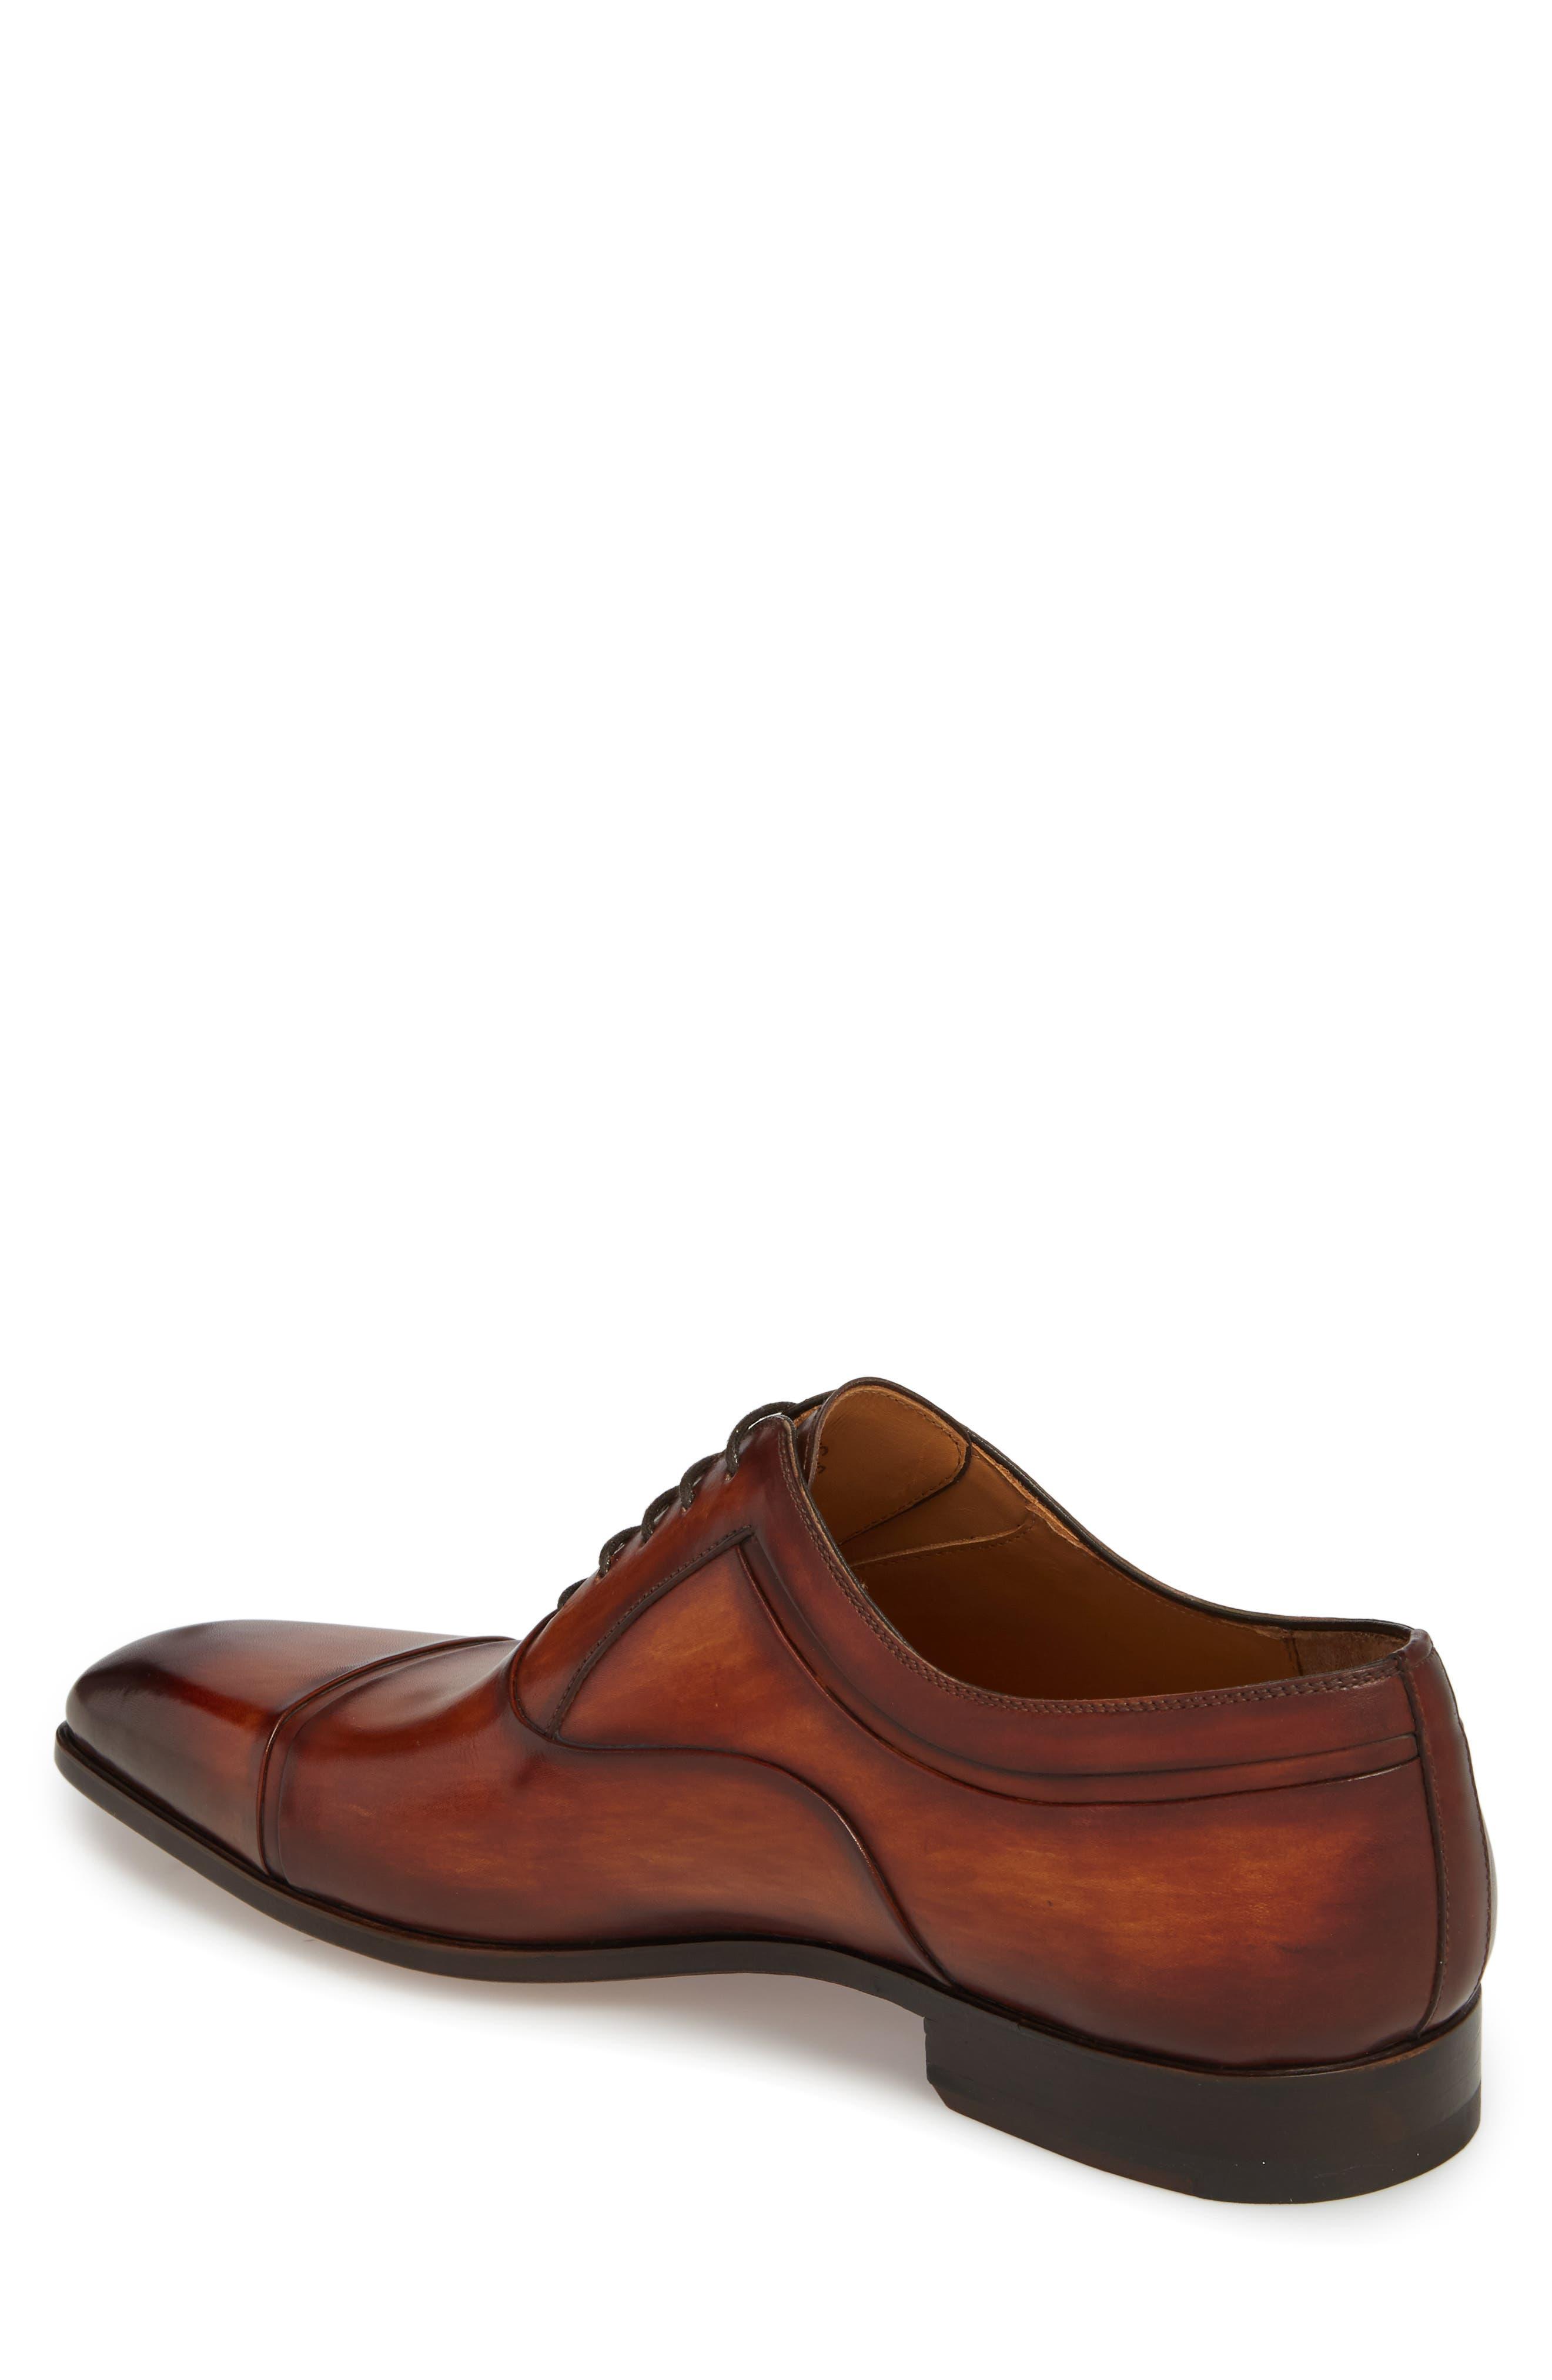 Tobin Cap Toe Oxford,                             Alternate thumbnail 2, color,                             Cognac Leather